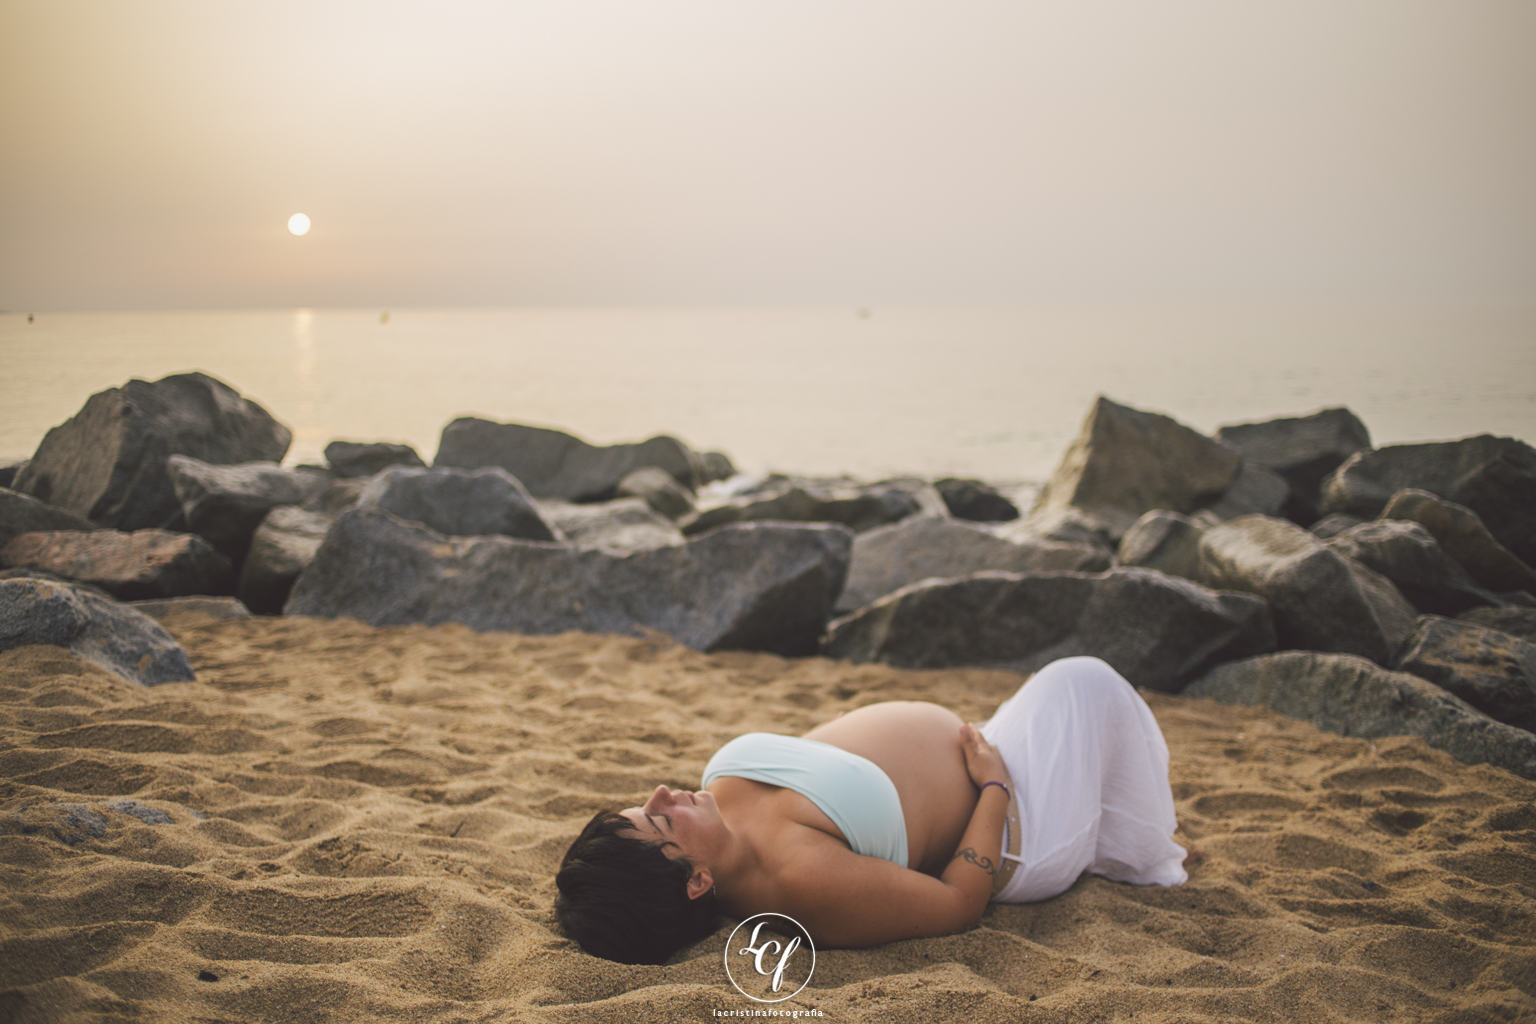 fotógrafo embarazo barcelona :: fotógrafo embarazo badalona :: fotógrafo embarazada pont del petrloli :: fotografía natural